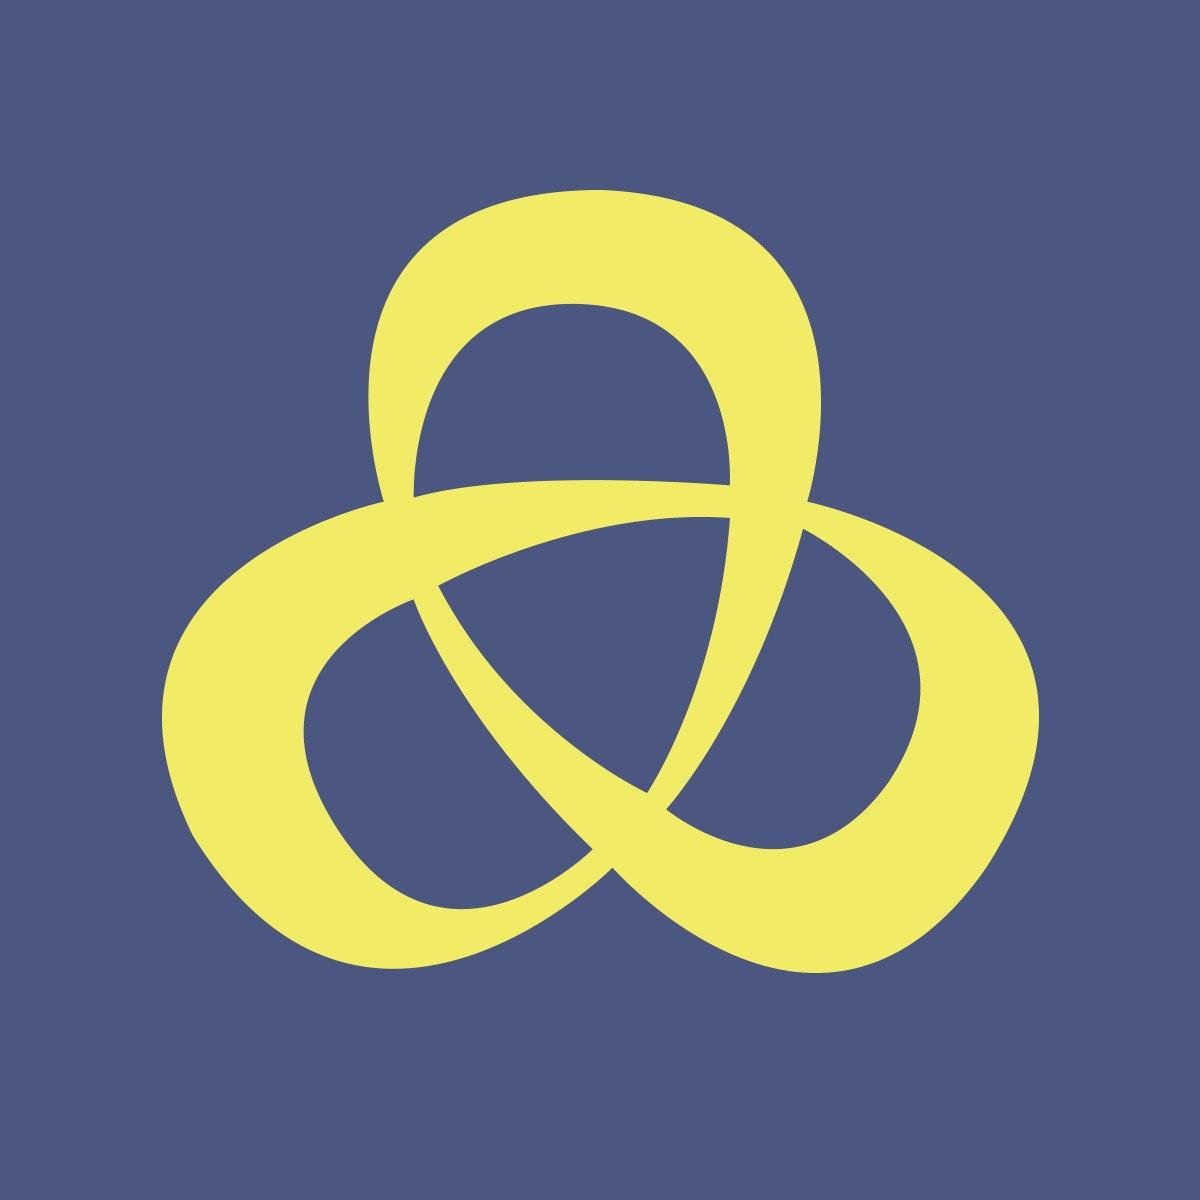 online_courses json · GitHub